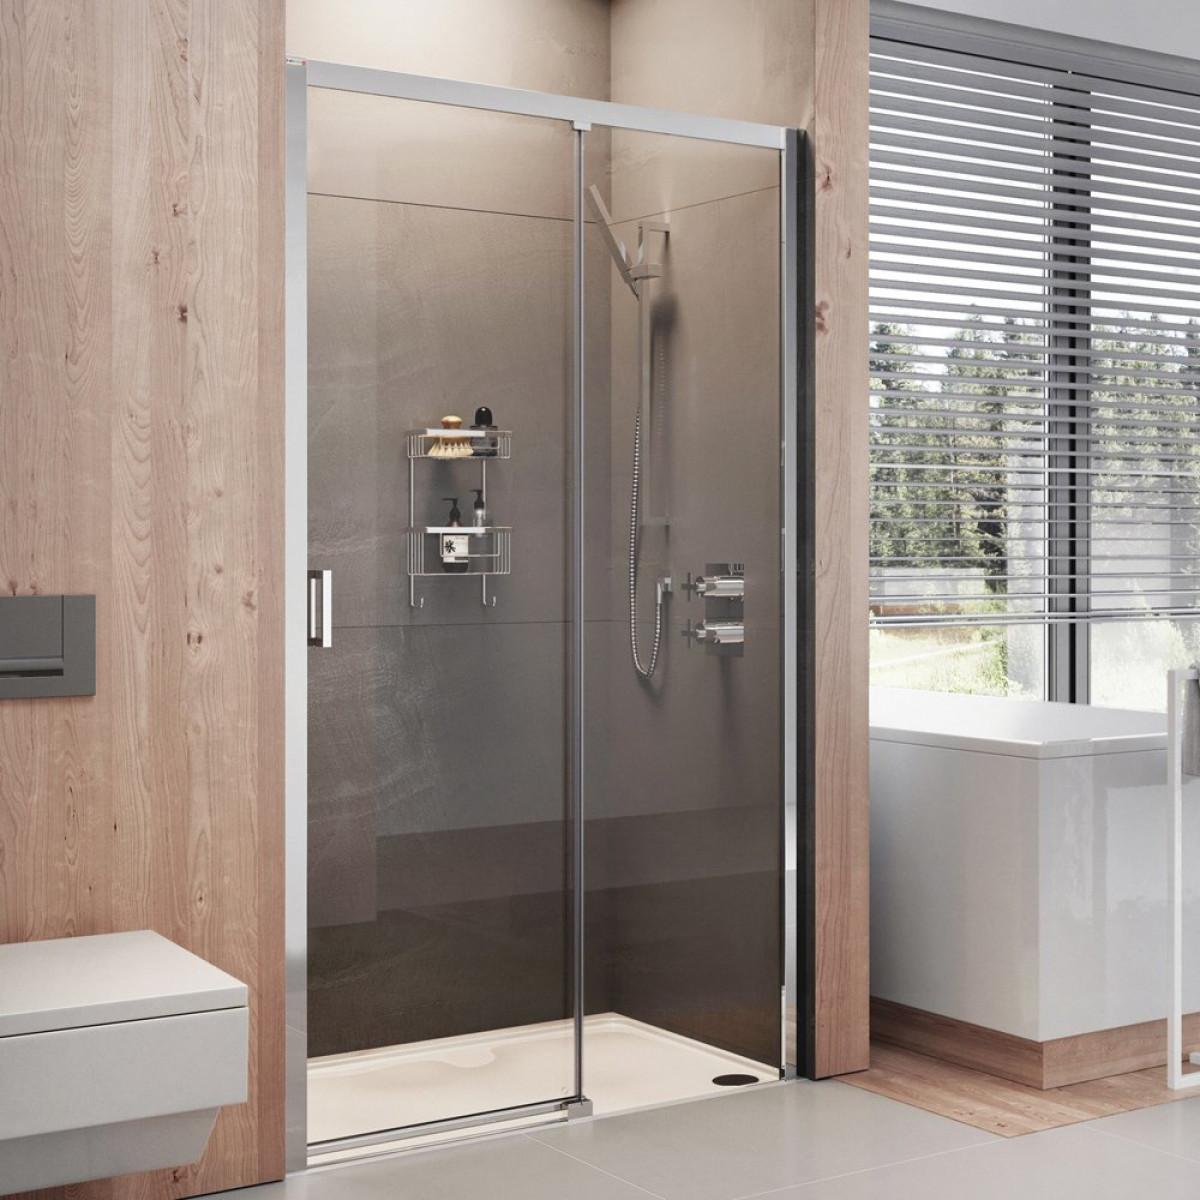 Roman lumin8 1700mm level access sliding door shower for 1700 high shower door